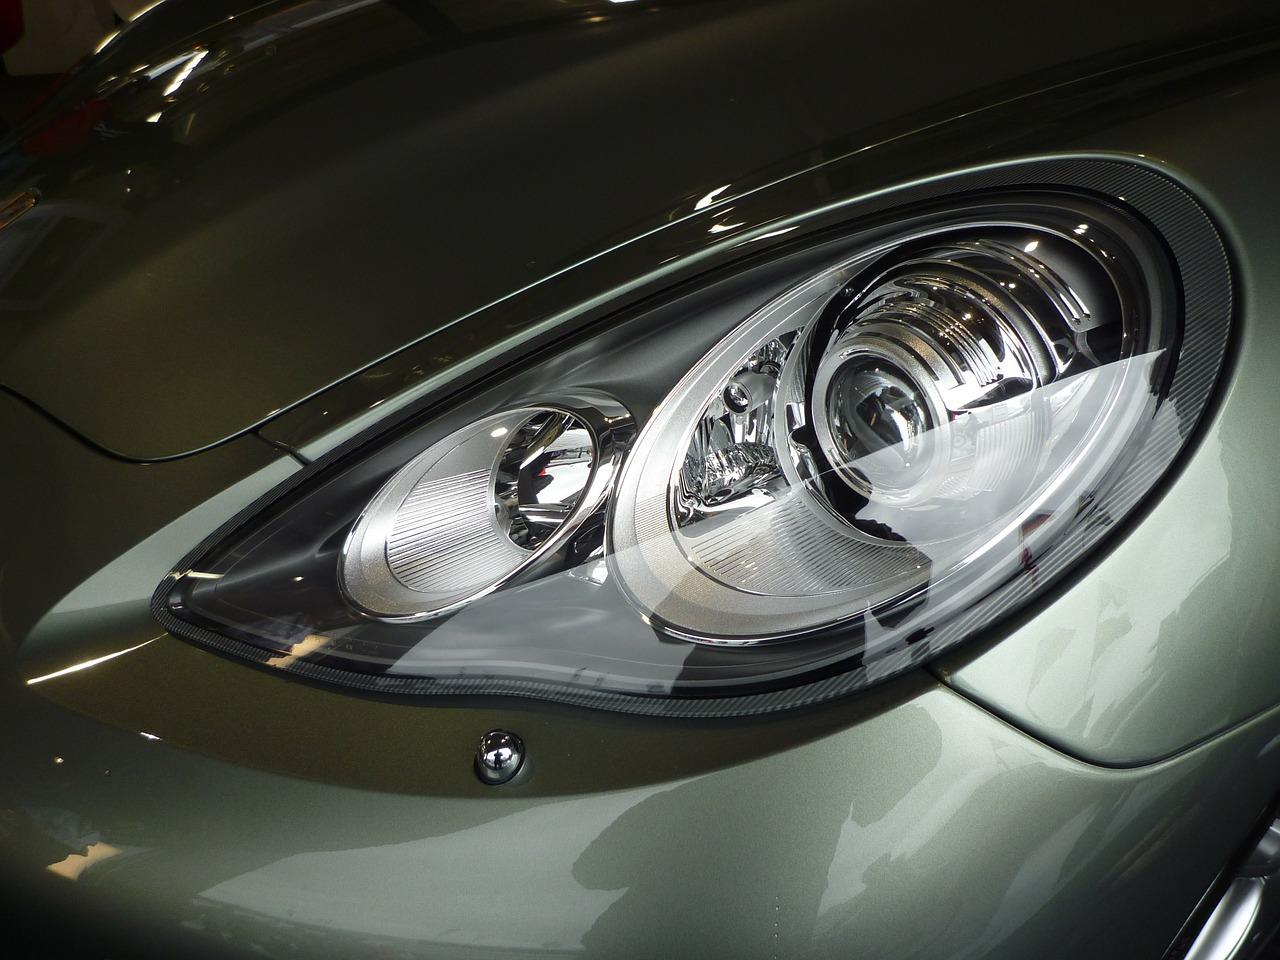 sports-car-245175_1280